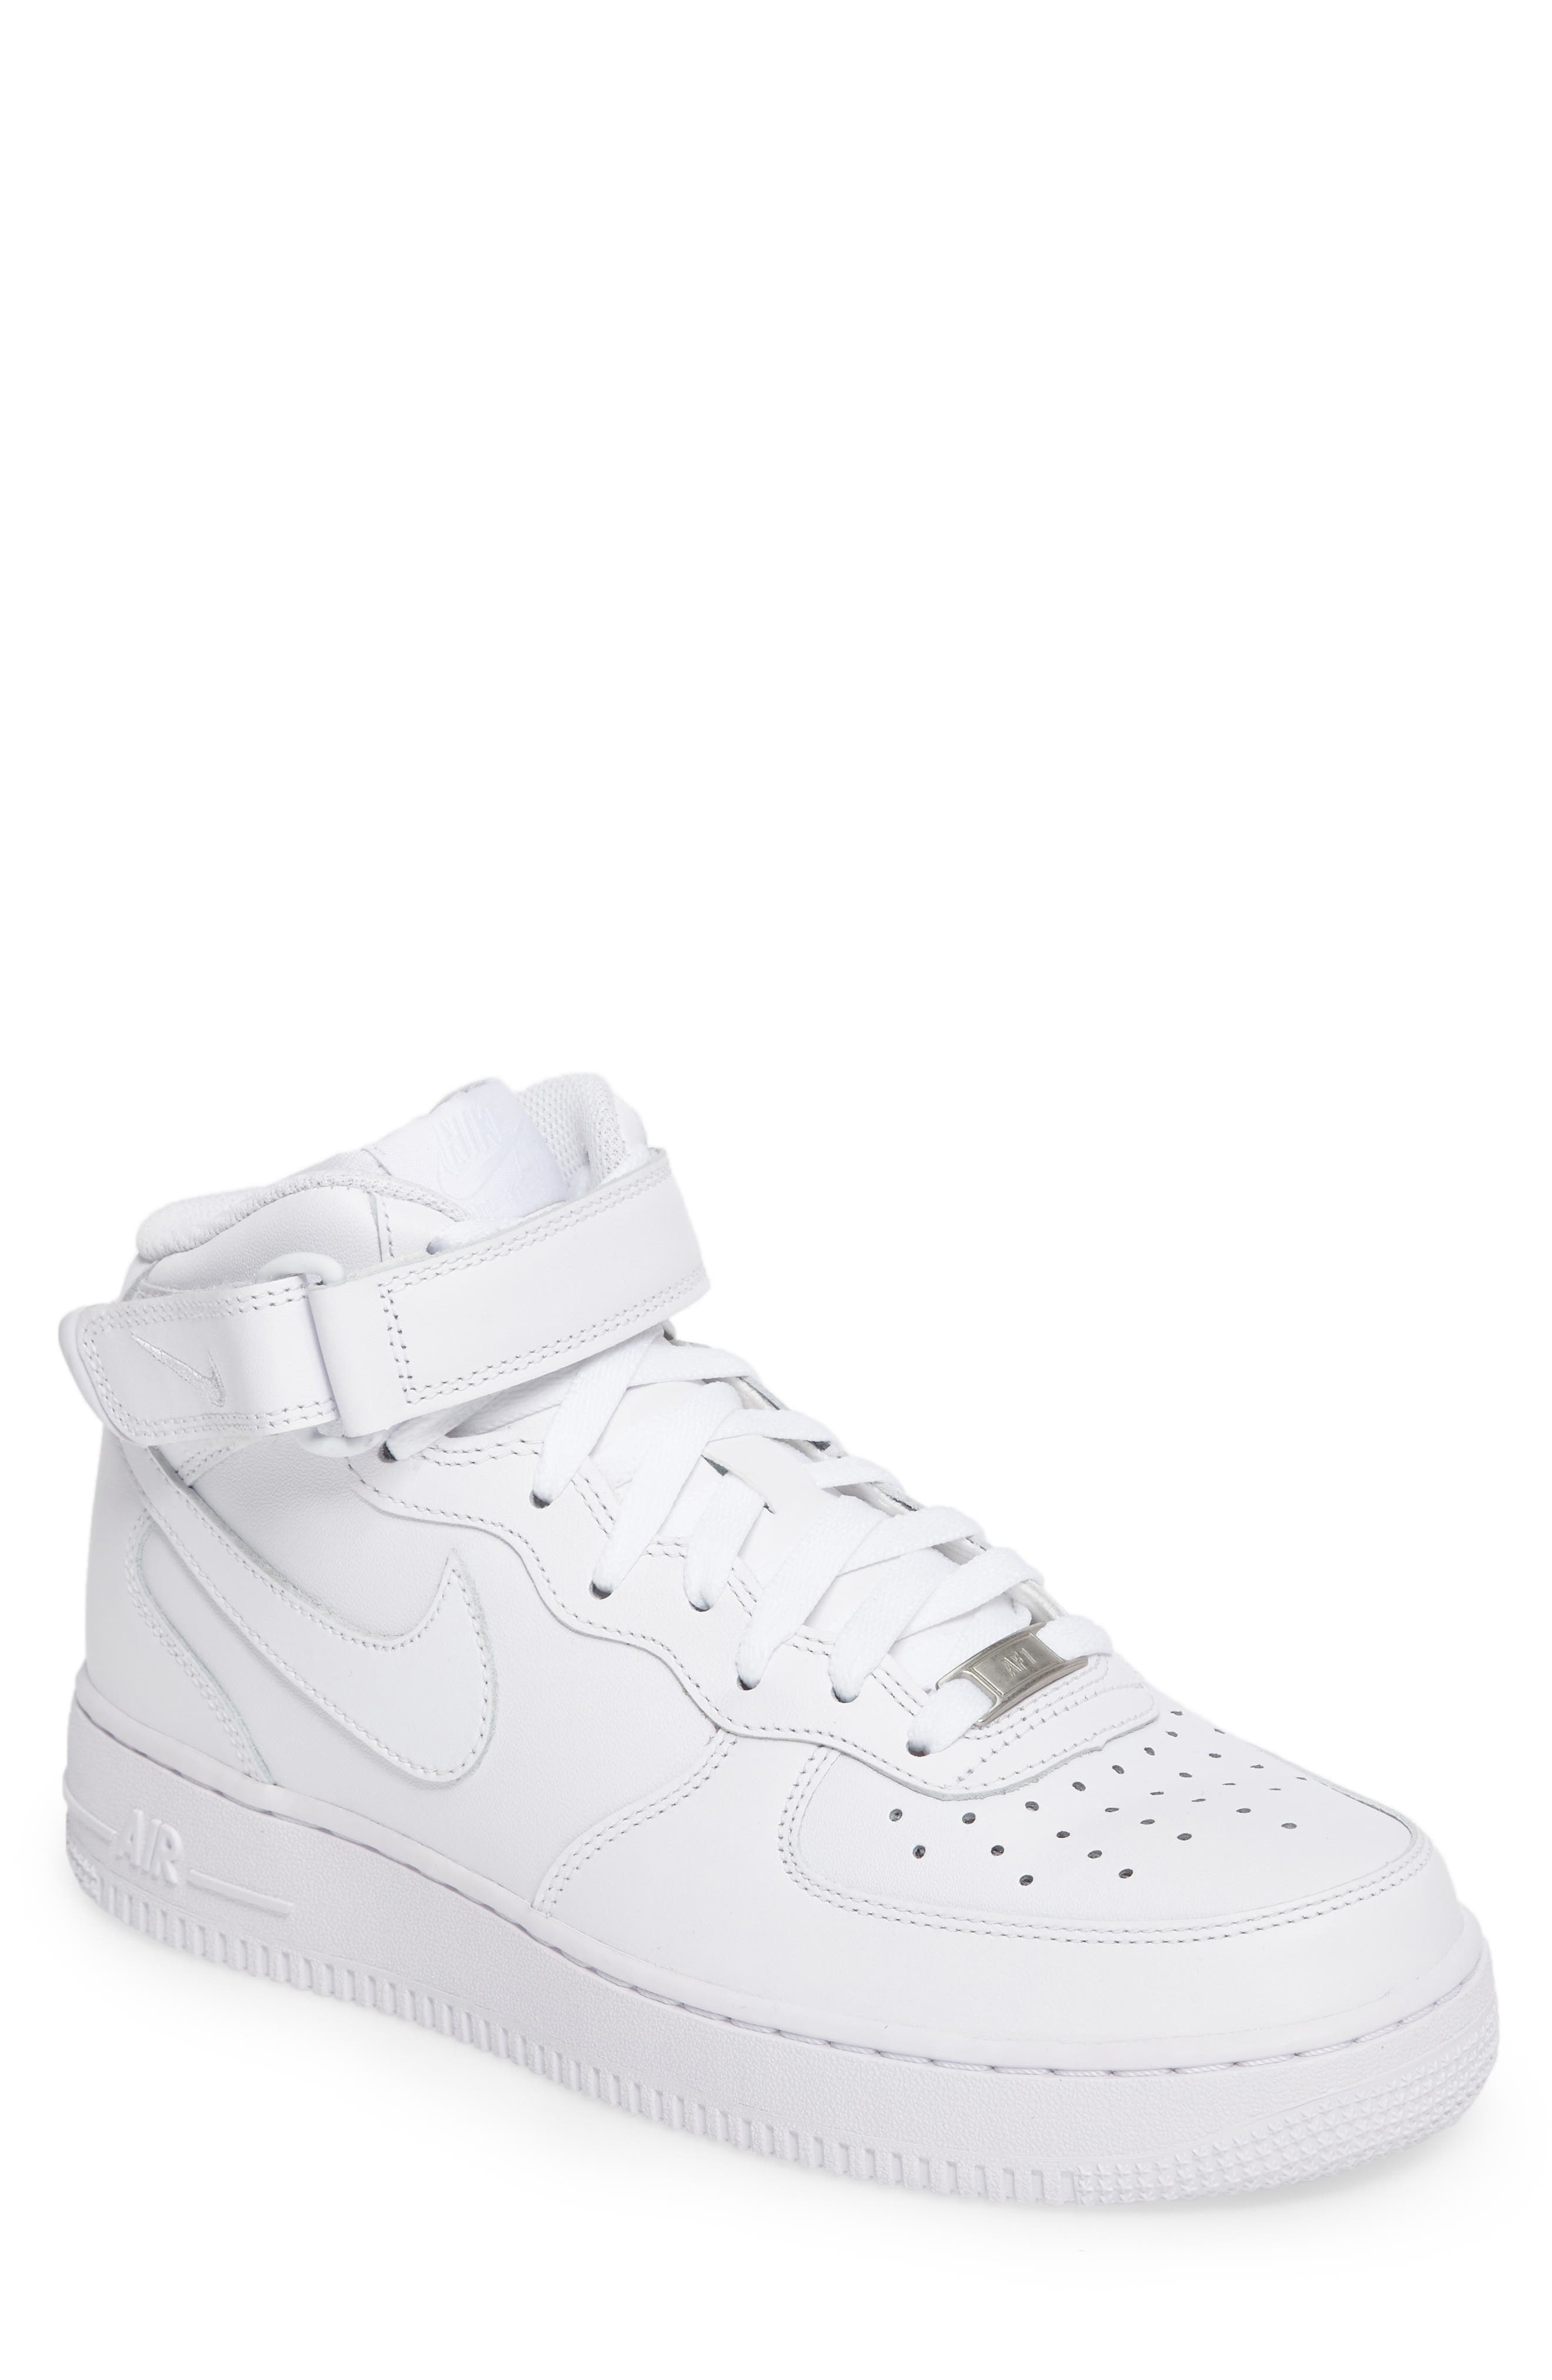 Nike Air Force 1 Mid '07 Sneaker (Men)